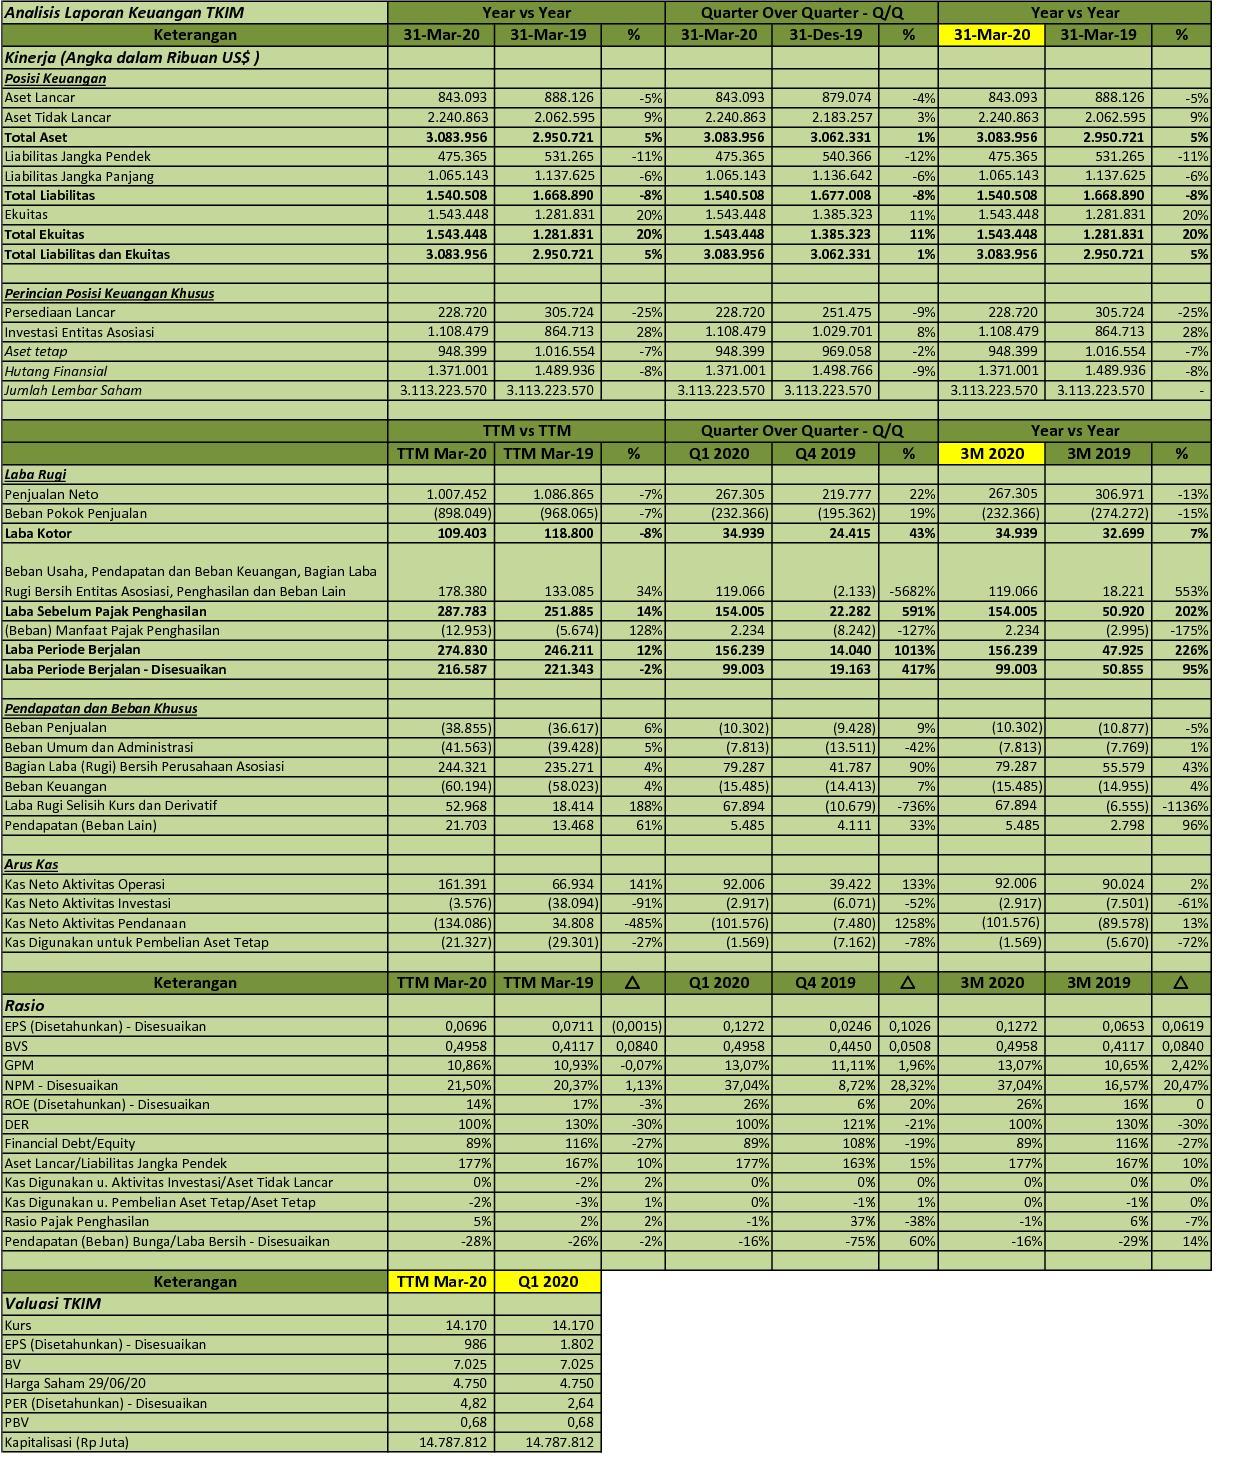 Idx Investor Tkim Q1 2020 Pt Pabrik Kertas Tjiwi Kimia Tbk Analisis Laporan Keuangan